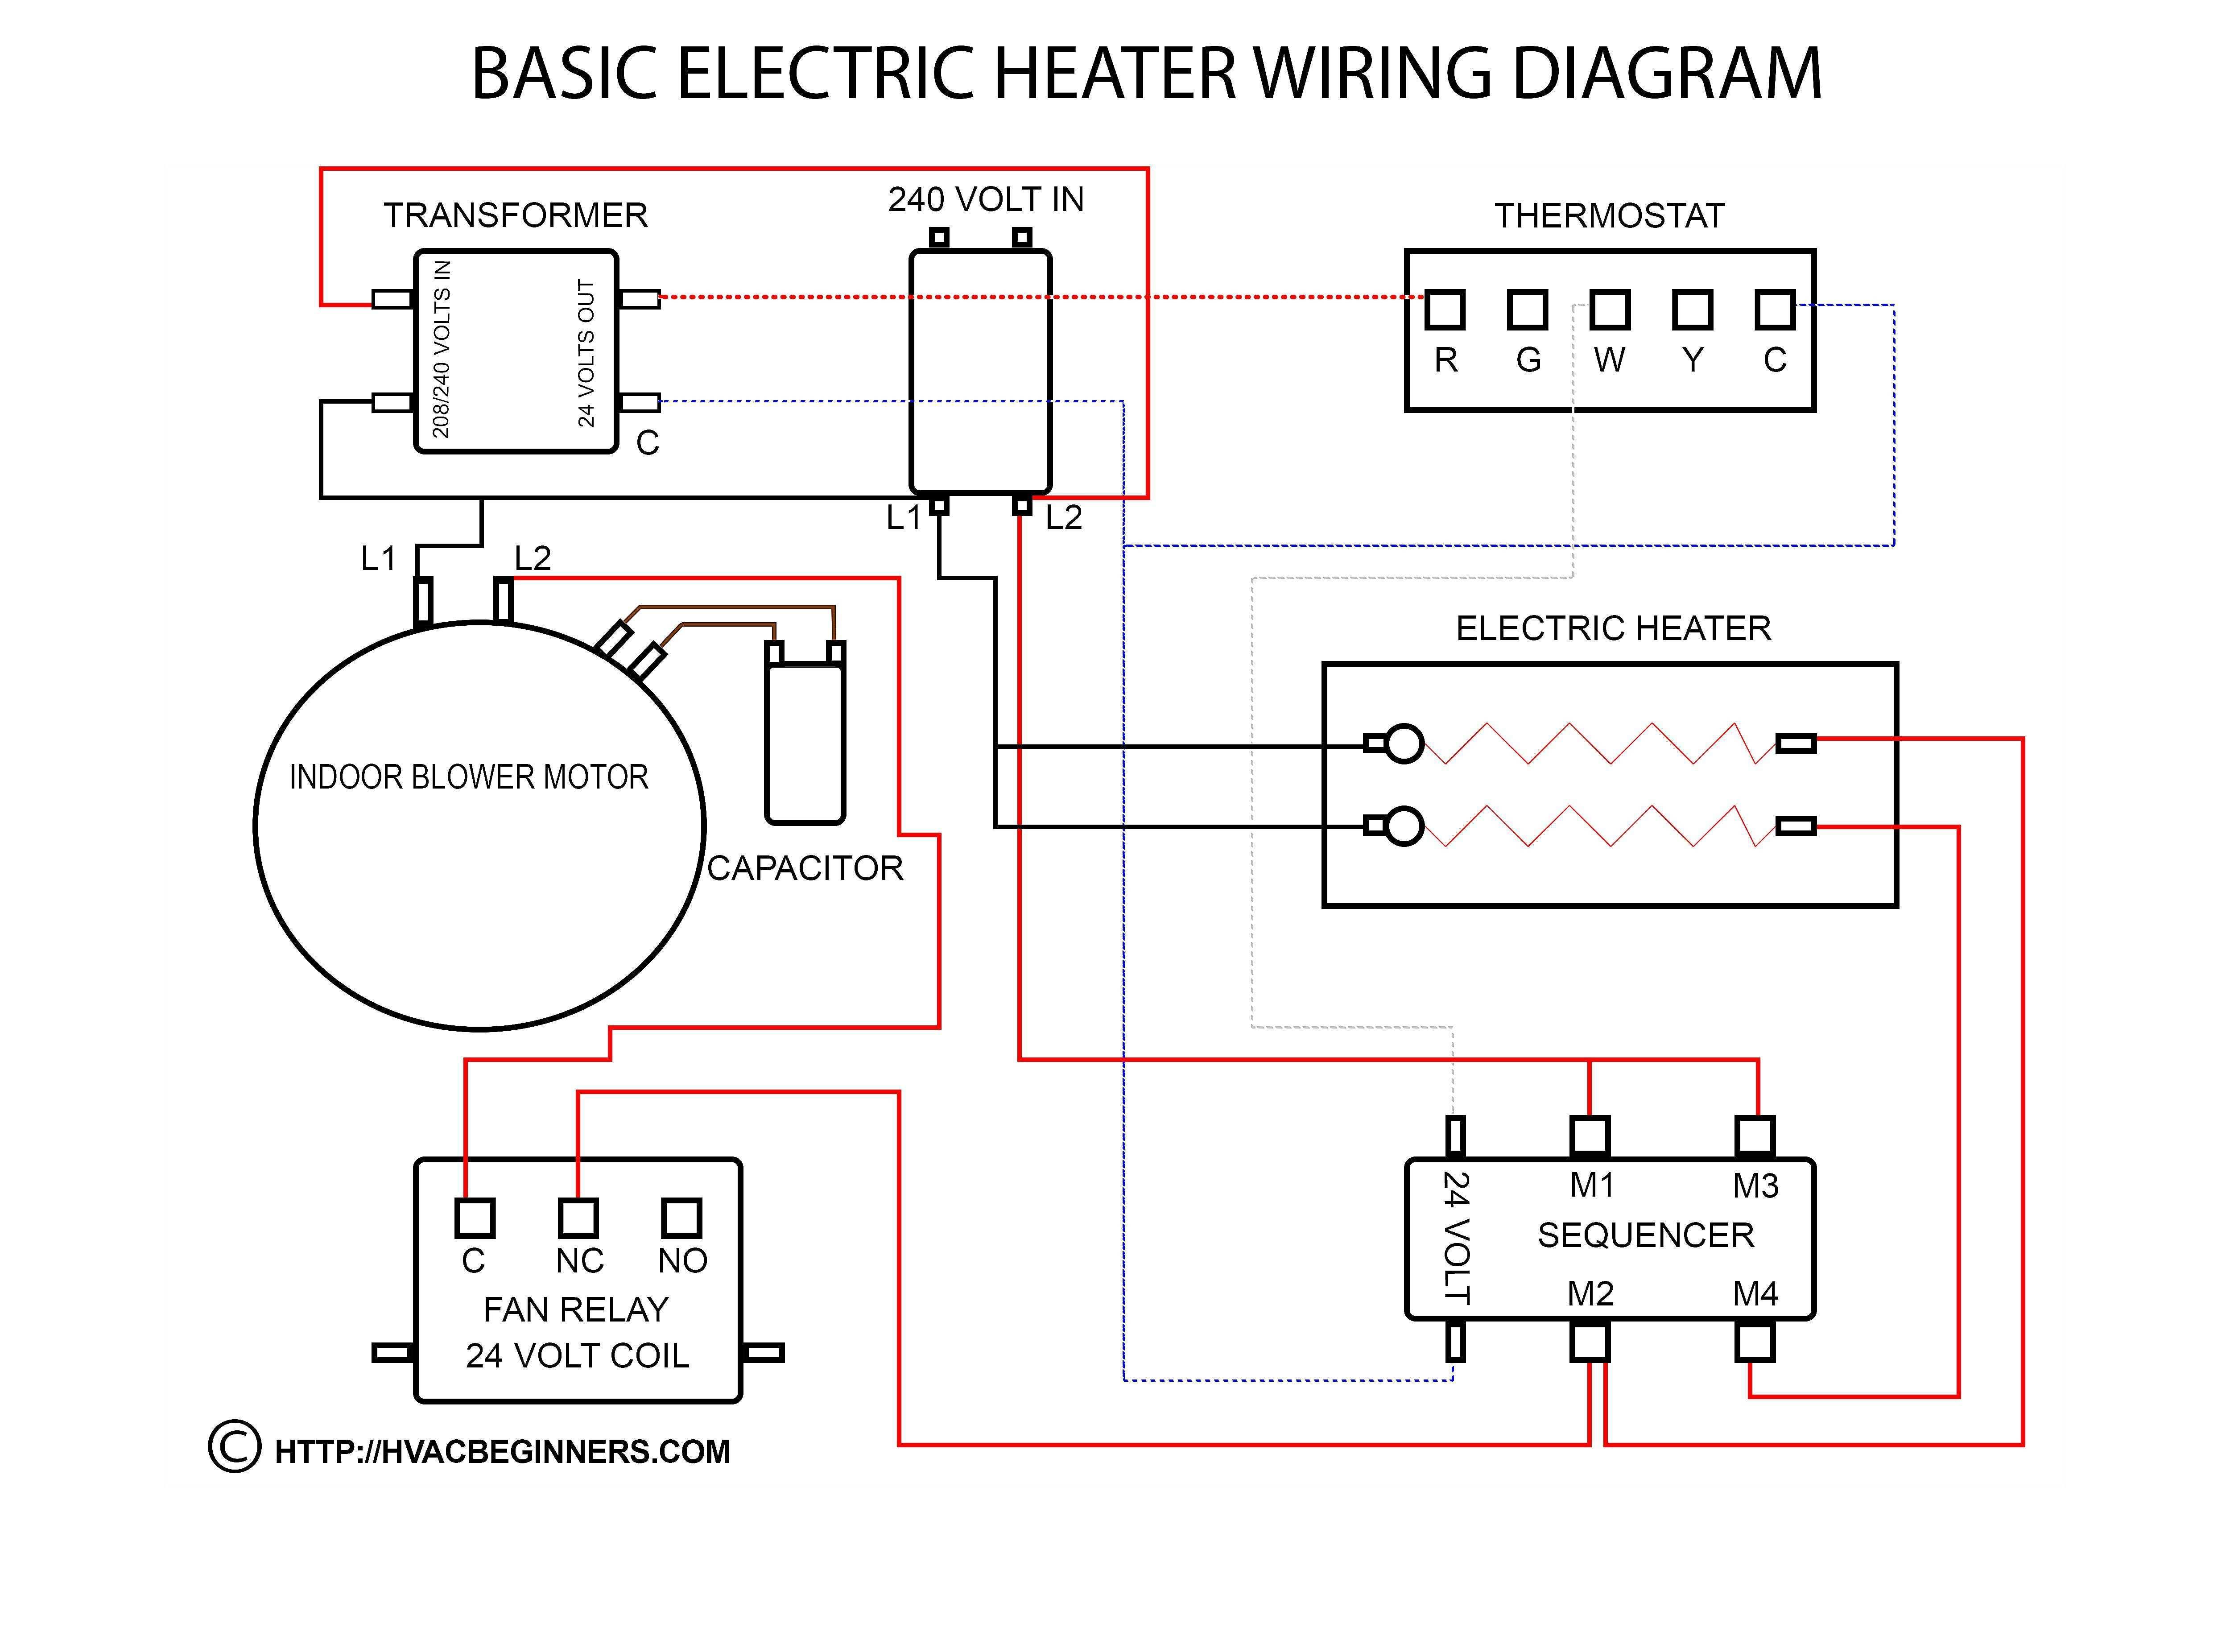 Electric Heater Wiring Diagram - Wiring Diagram Data - Electric Water Heater Thermostat Wiring Diagram